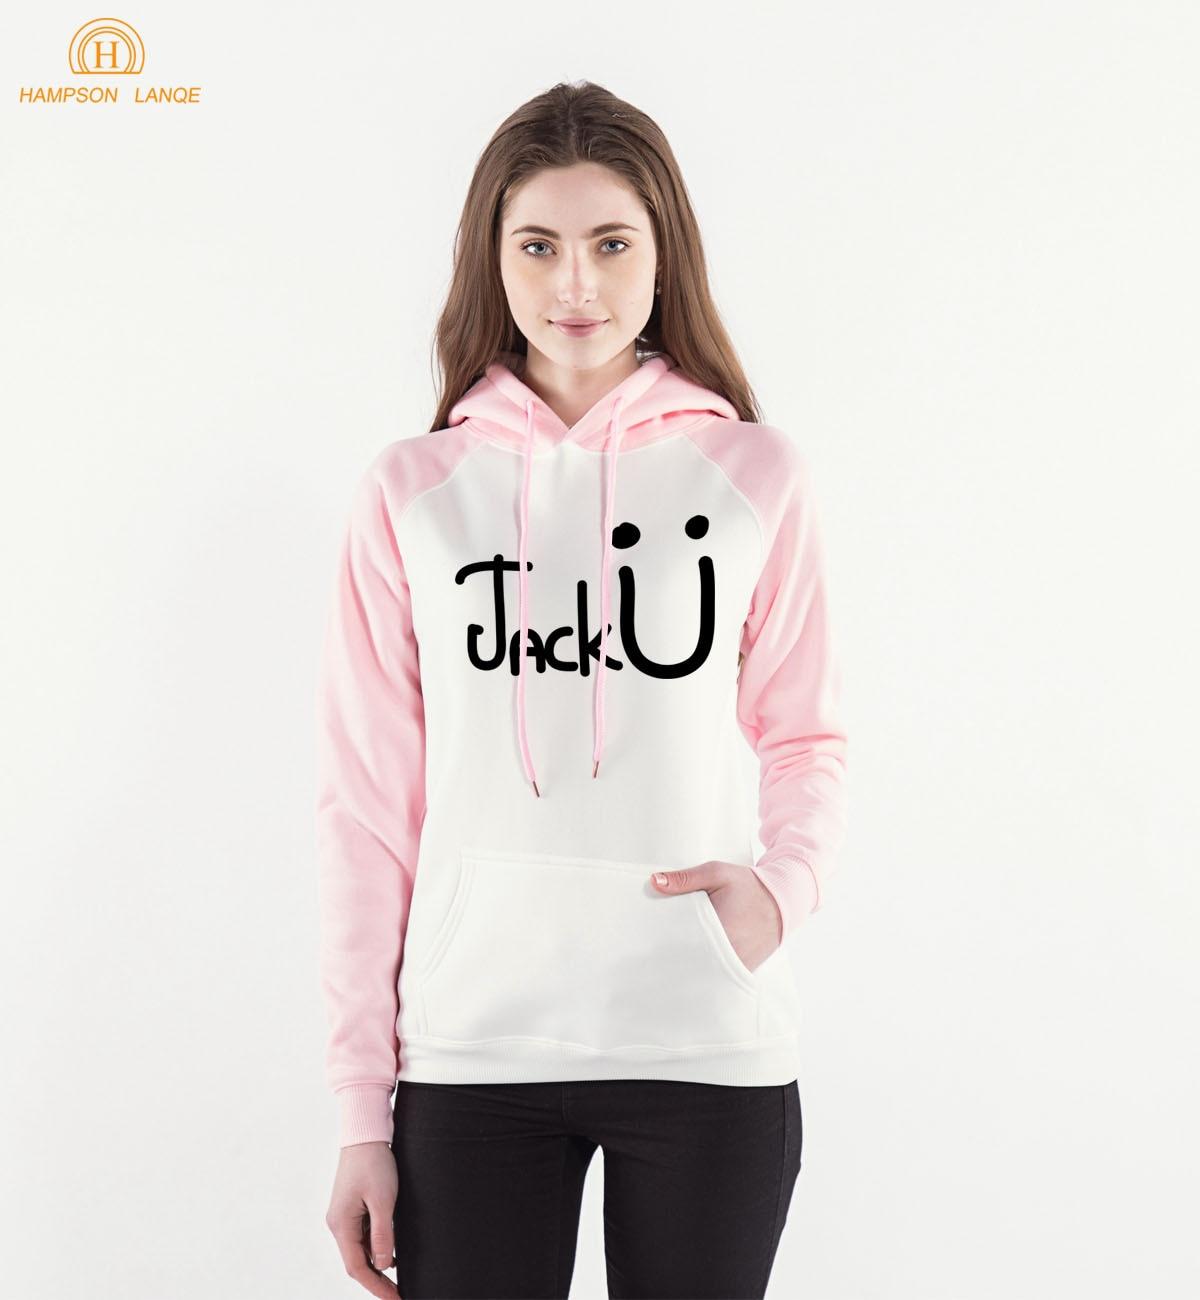 Famous Band Jack U Funny Hoodies Women 2018 Spring Autumn Kawaii Pink Sweatshirt Women Kpop Raglan Hooded Harajuku Hoody S-XXL